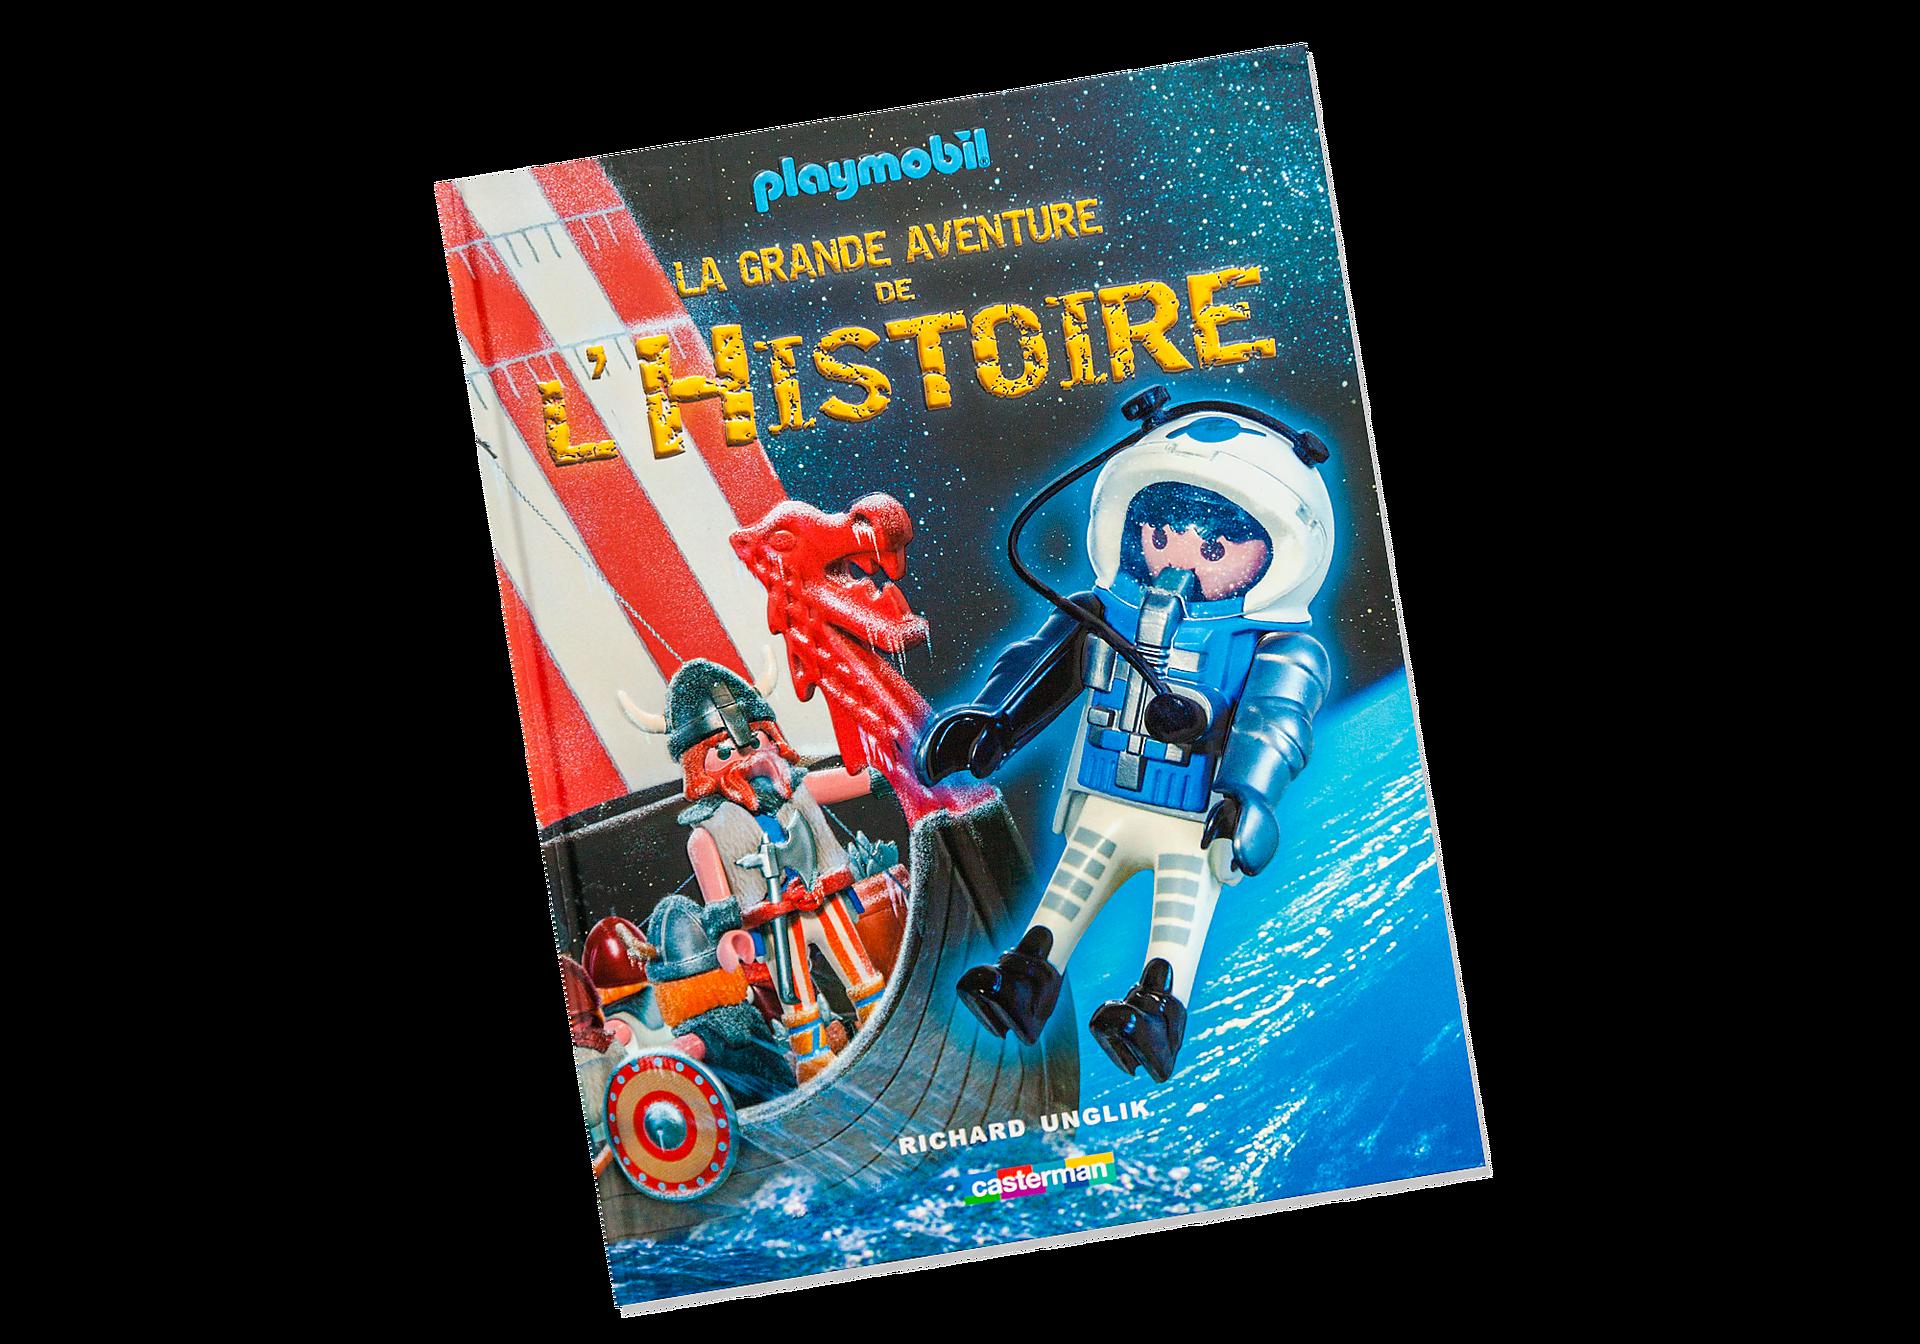 http://media.playmobil.com/i/playmobil/80042_product_detail/La grande Aventure de I`Histoire avec PLAYMOBIL français